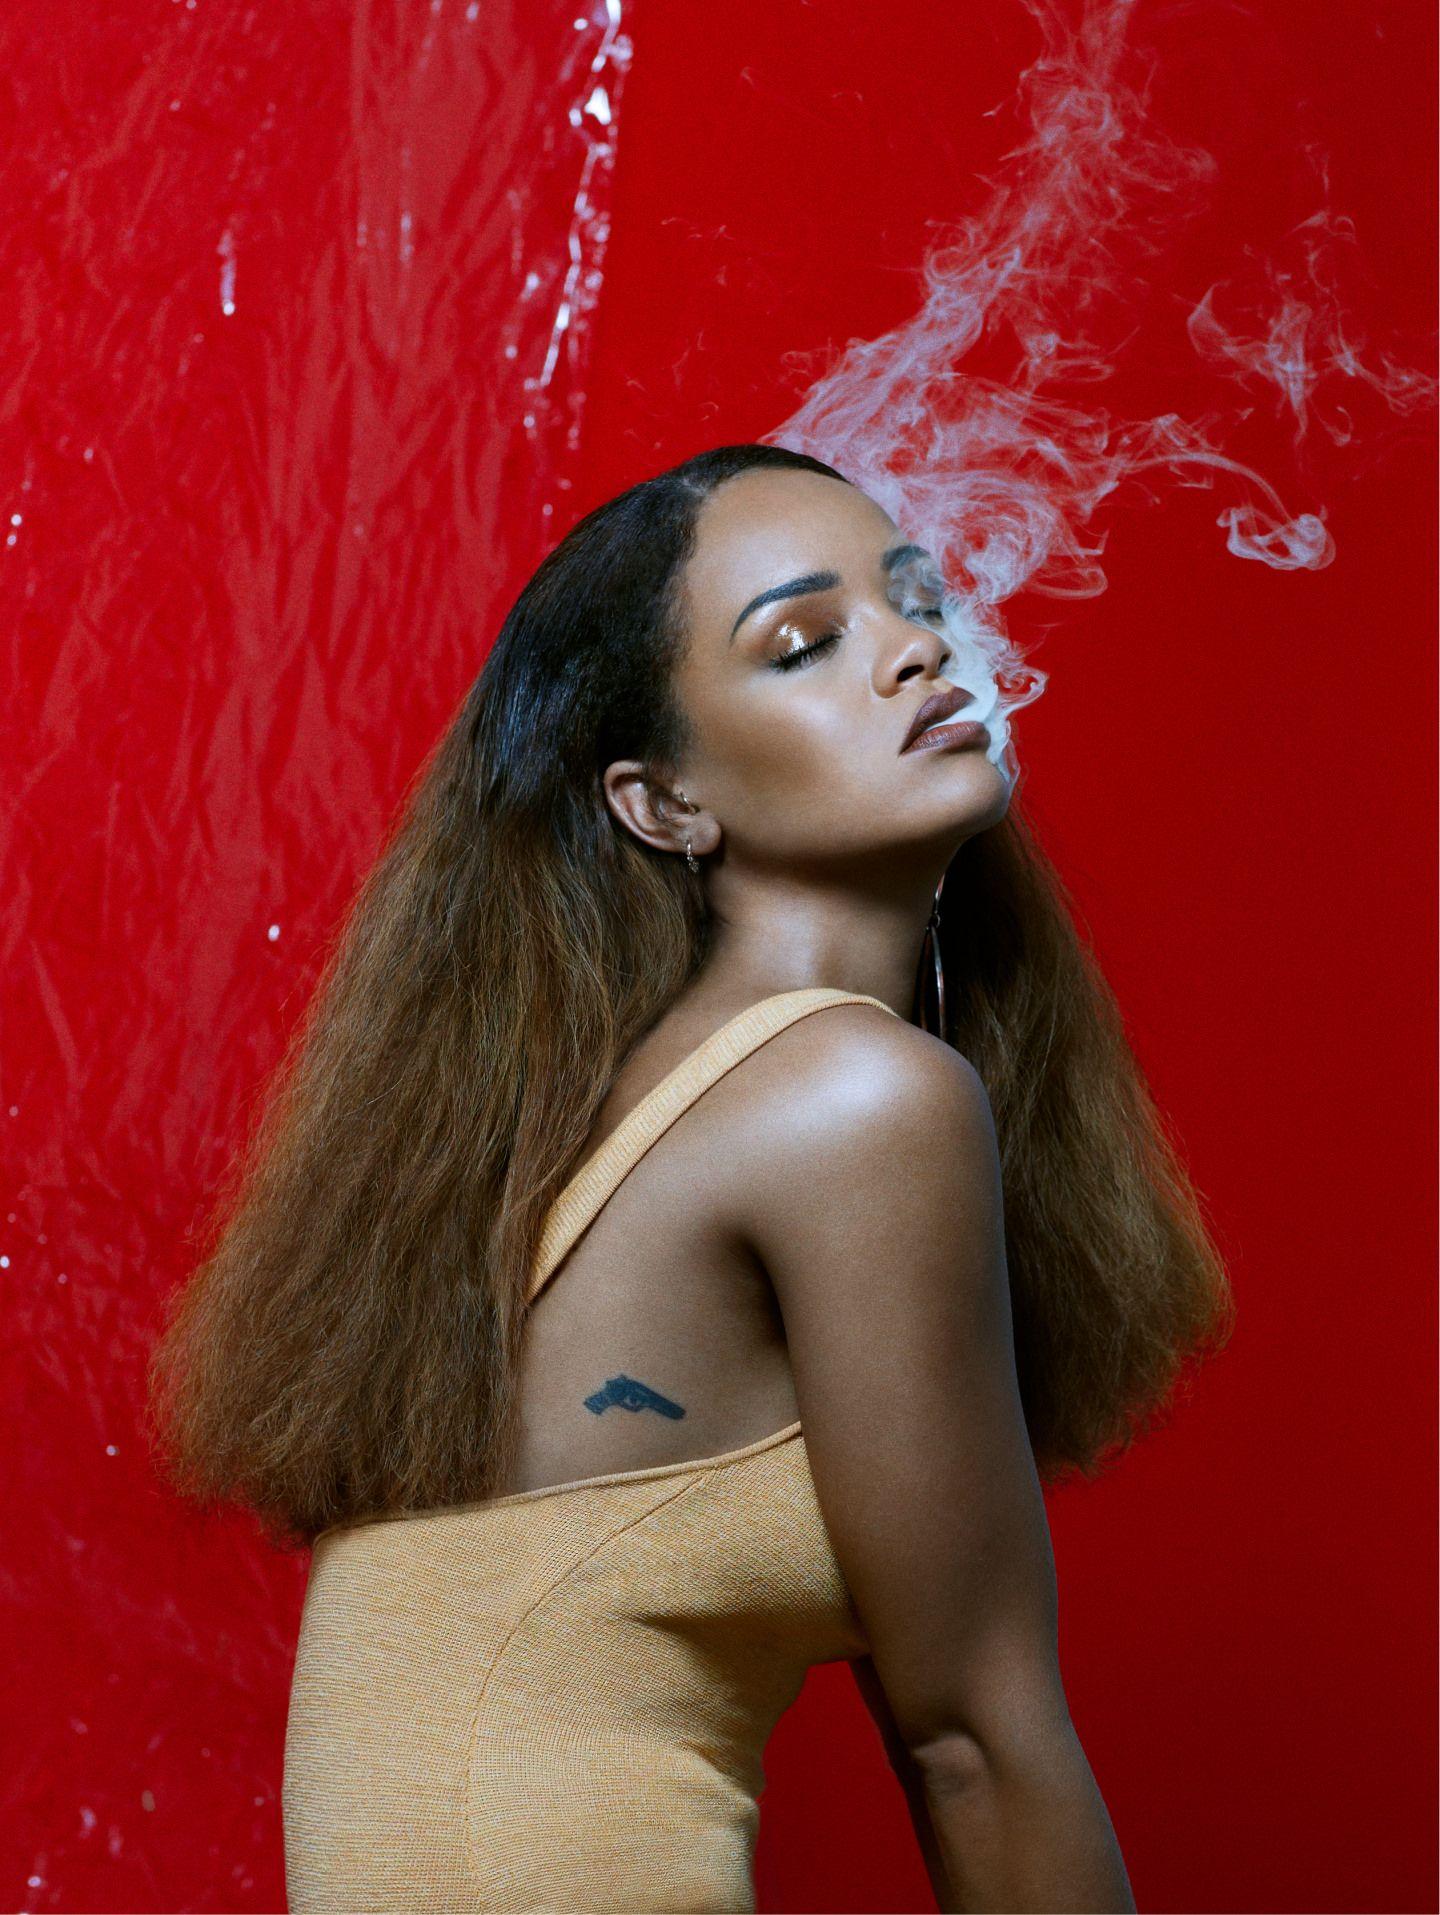 Rihanna iphone wallpaper tumblr - Becoming Rihanna